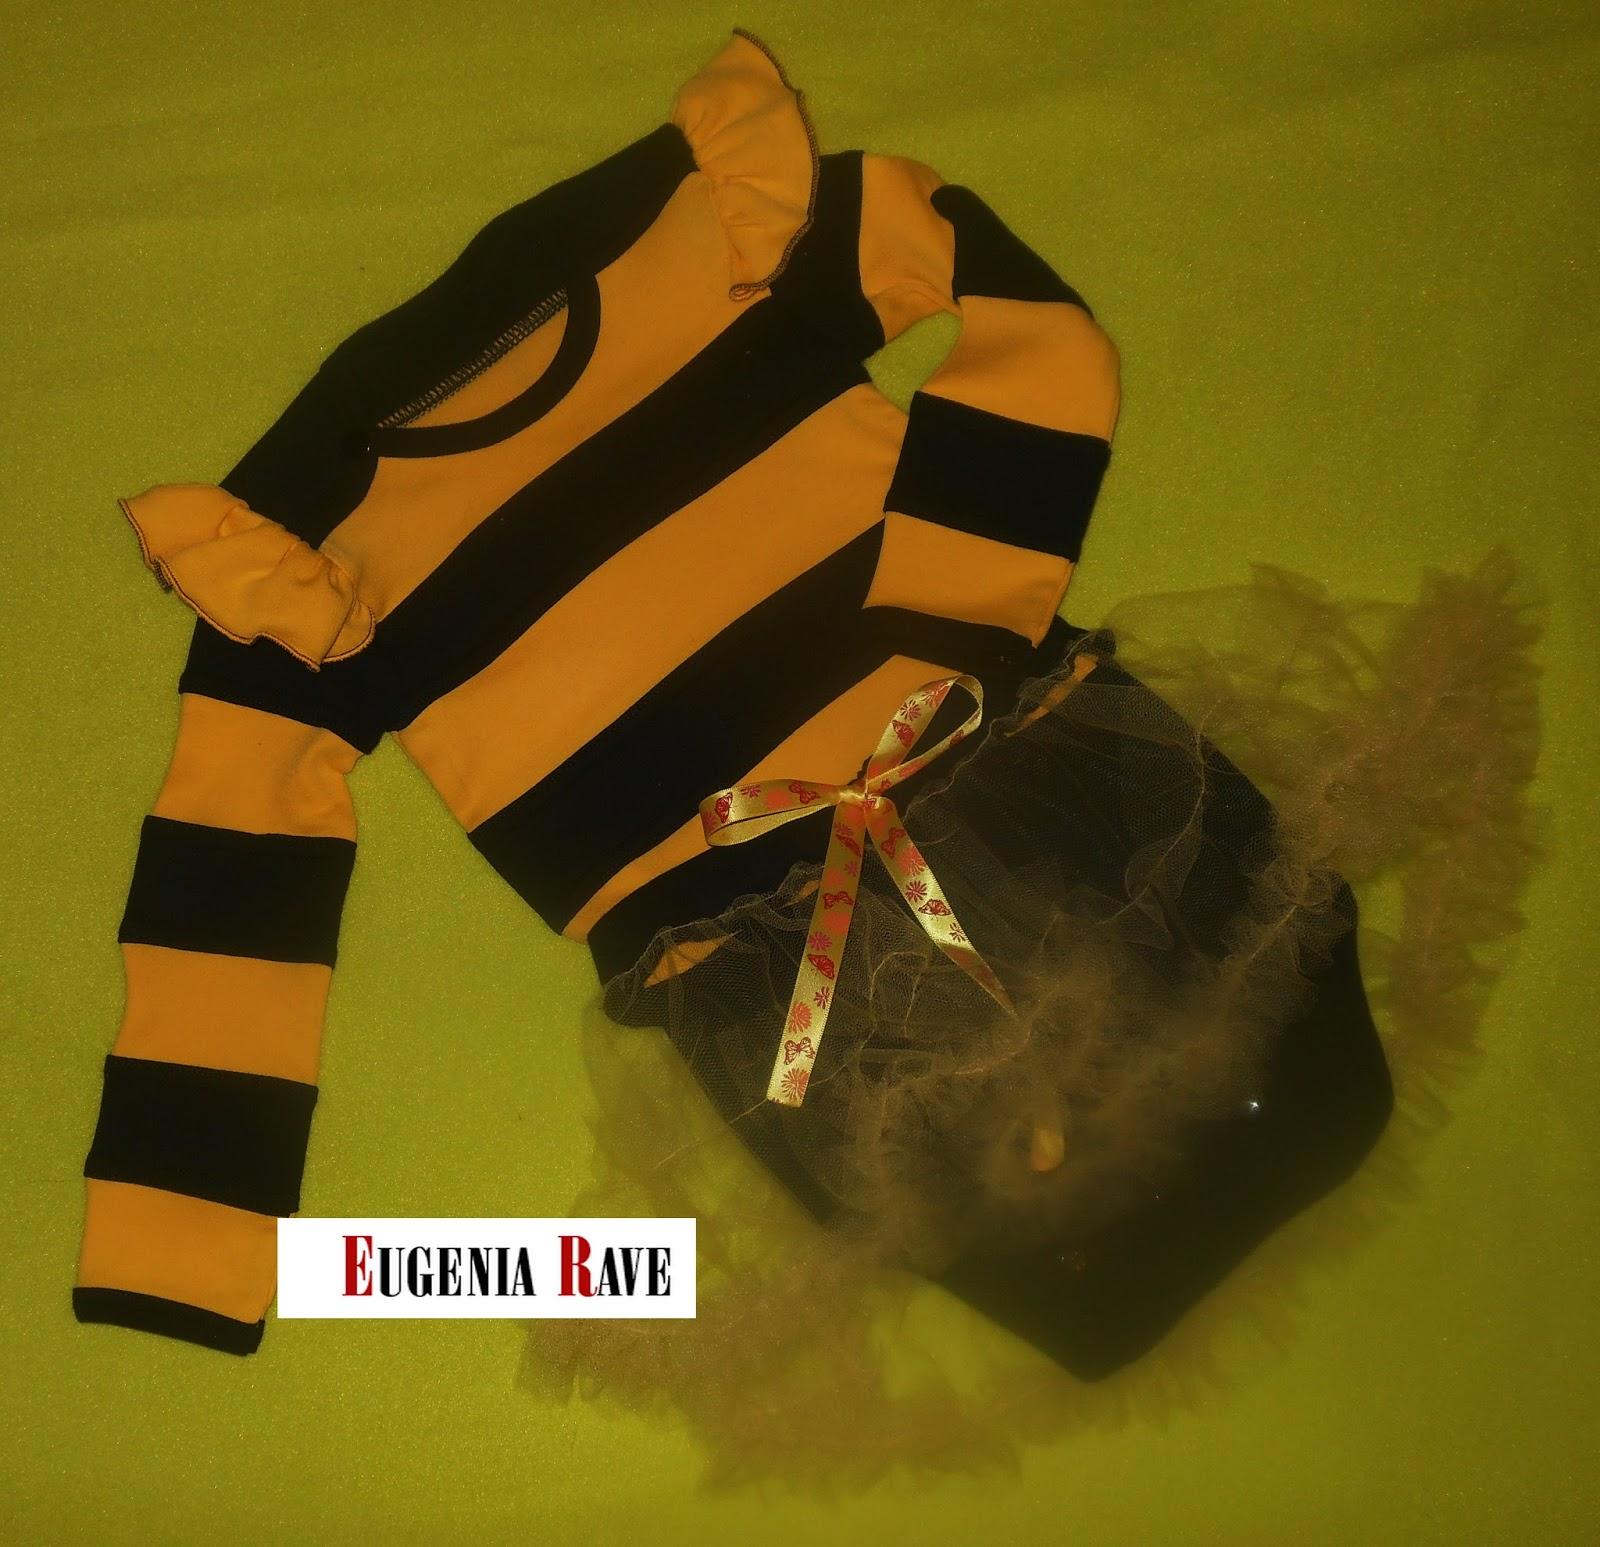 костюм для малышки, костюм для малышки на новый год, костюм пчелки, билайн, полосатый трикотаж